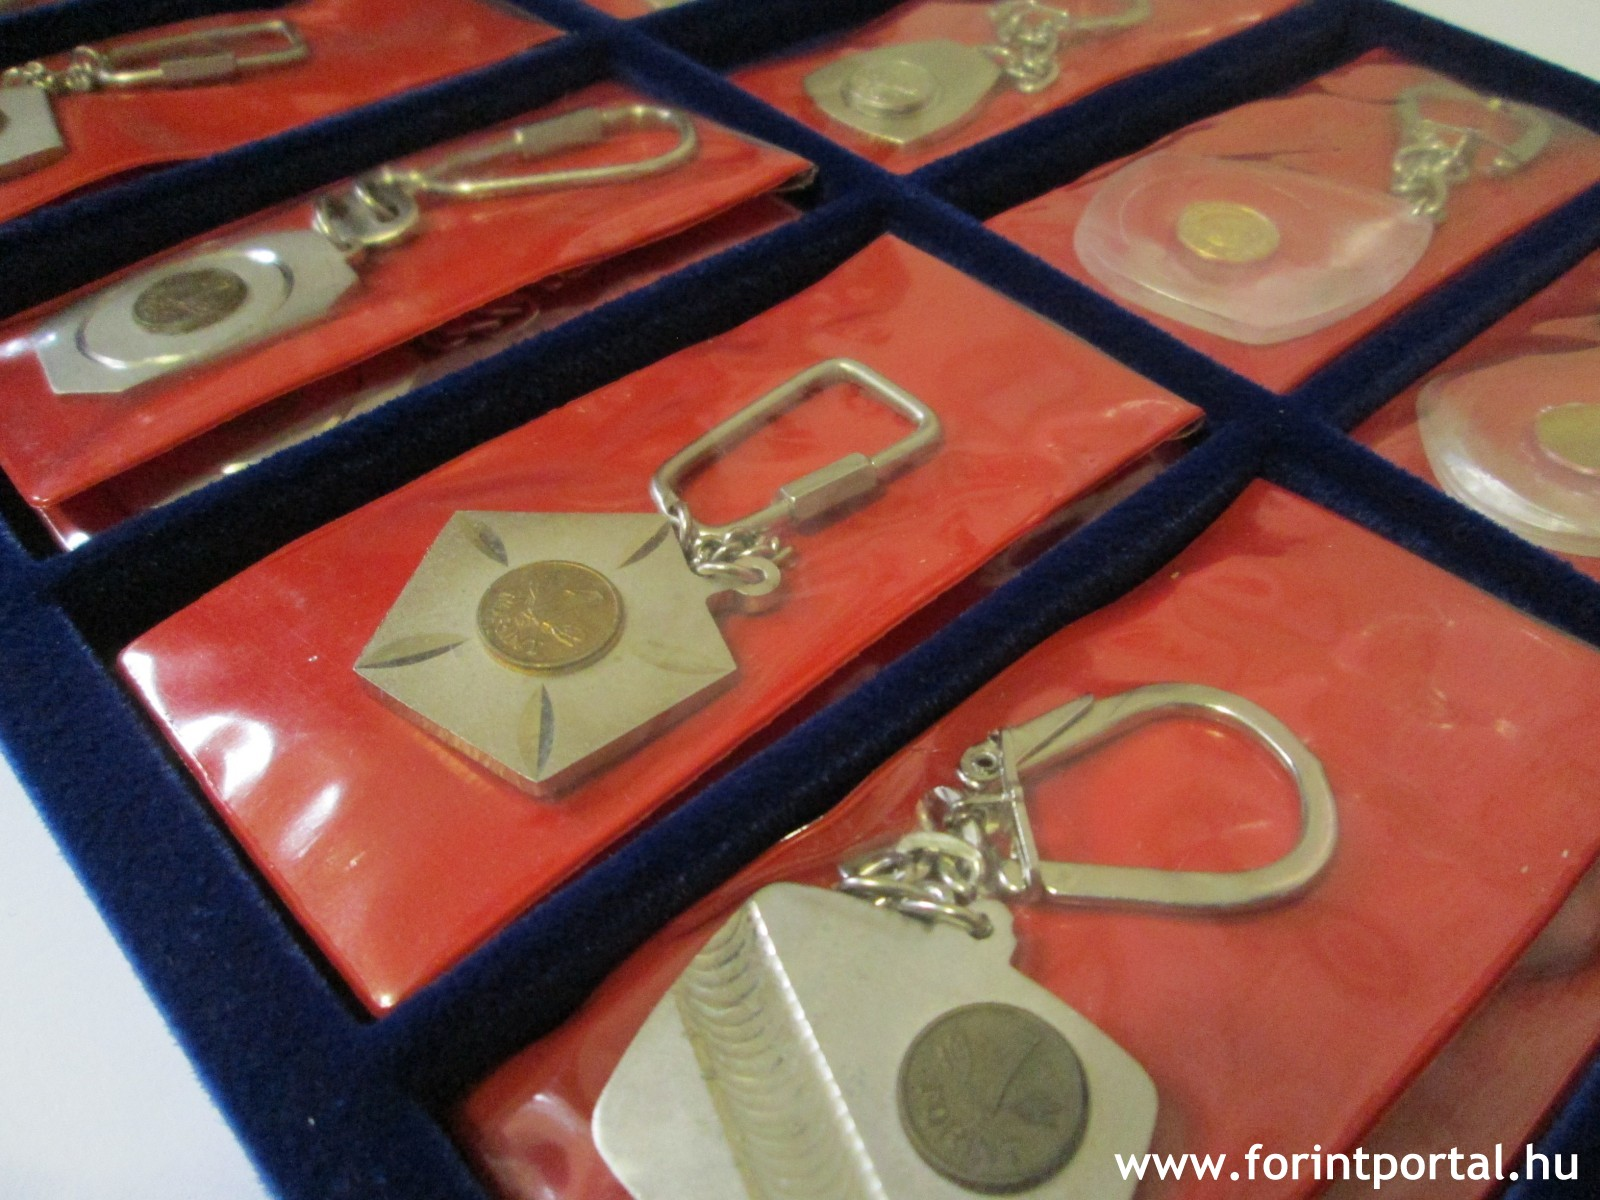 http://www.forintportal.hu/hirek/mini-1-forintos-kulcstartok/mini-1-forintos-kulcstartok-apv-allami-penzvero-regi-kulcstarto-1ft_08.jpg